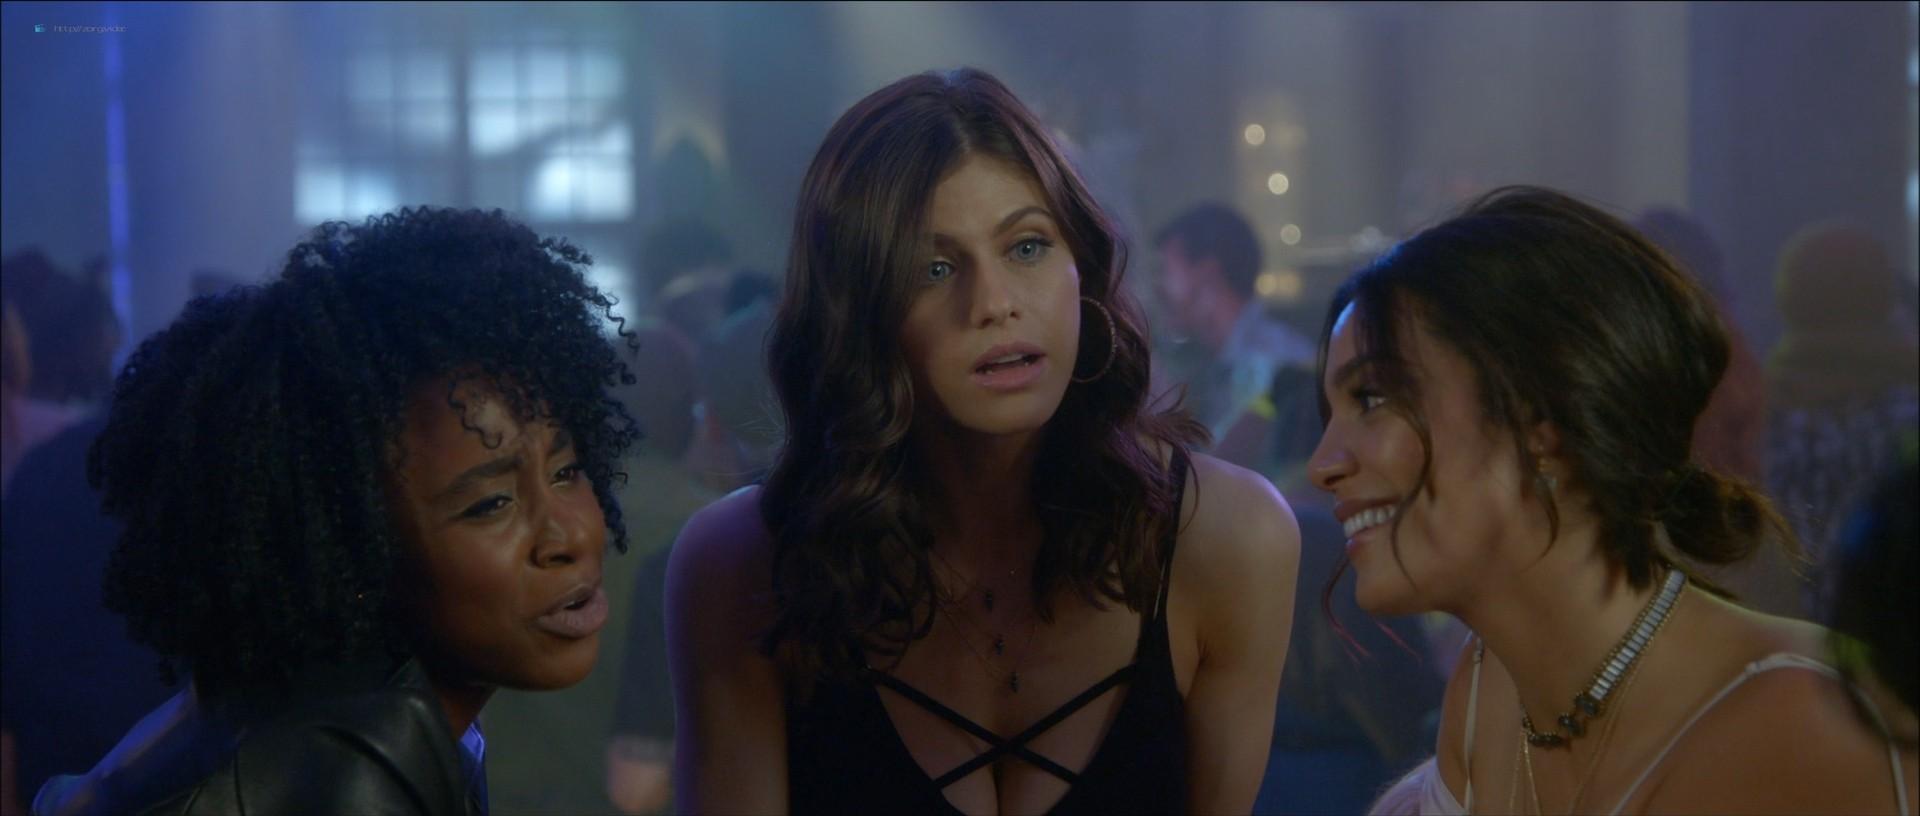 Alexandra Daddario sexy Lucy Liu hot and some sex - Why Women Kill (2019) s1e3 HD 1080p Web (8)